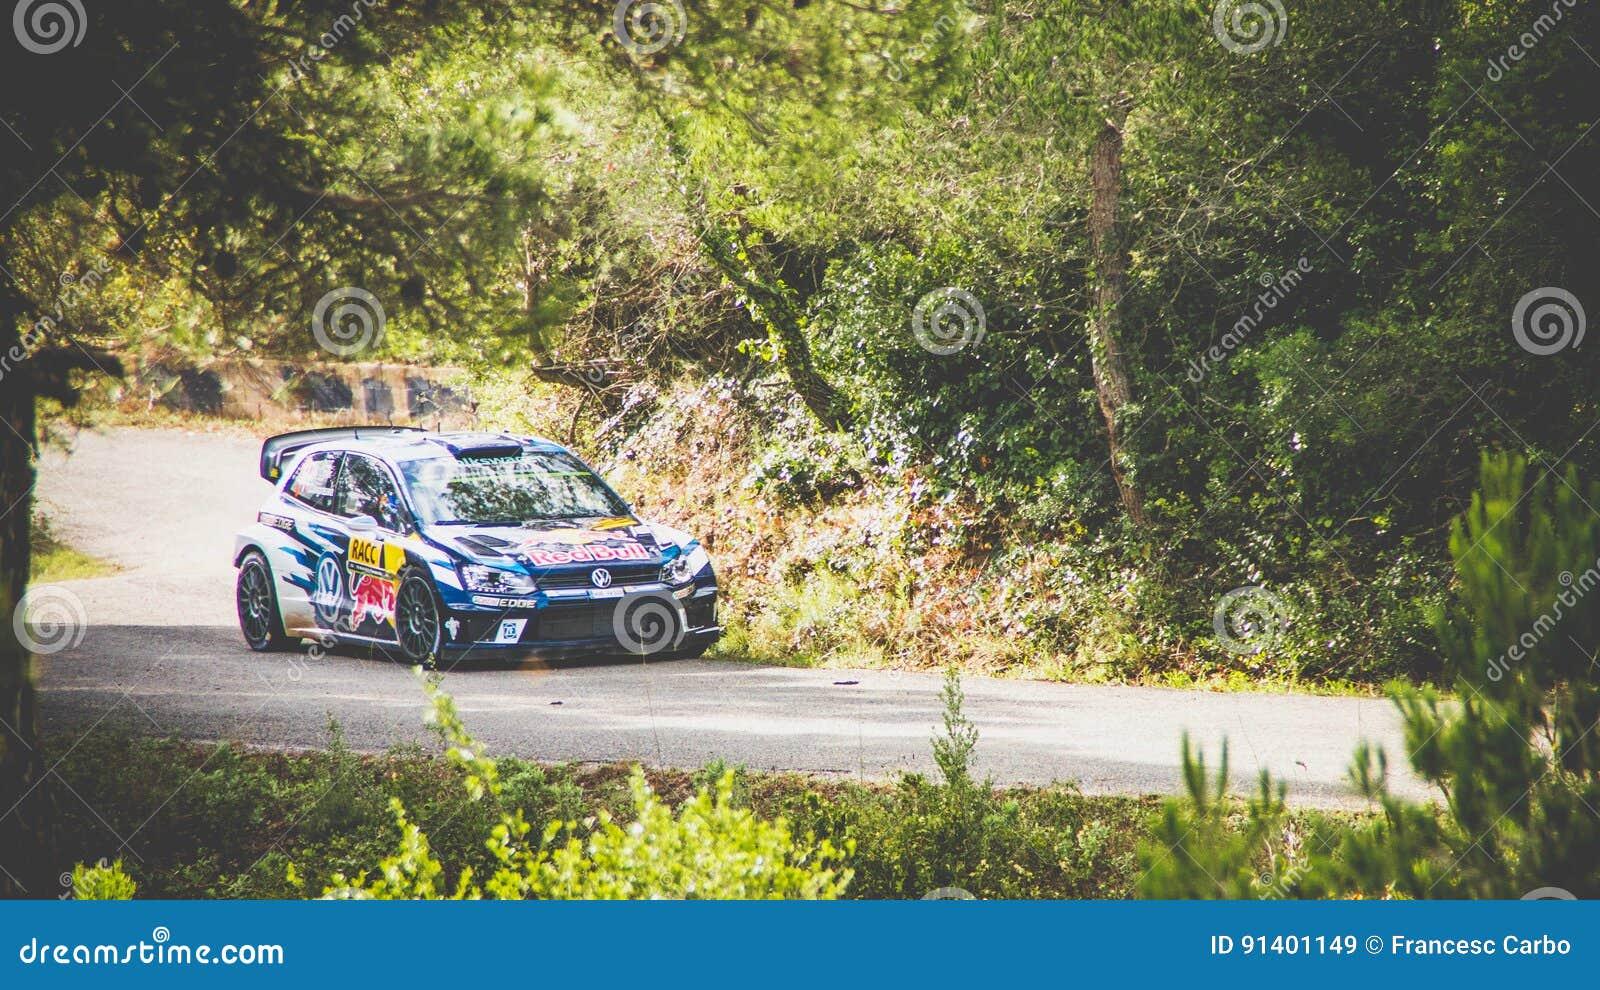 Volkswagen Polo World Rally Car Editorial Stock Image Image Of Racing Ogier 91401149